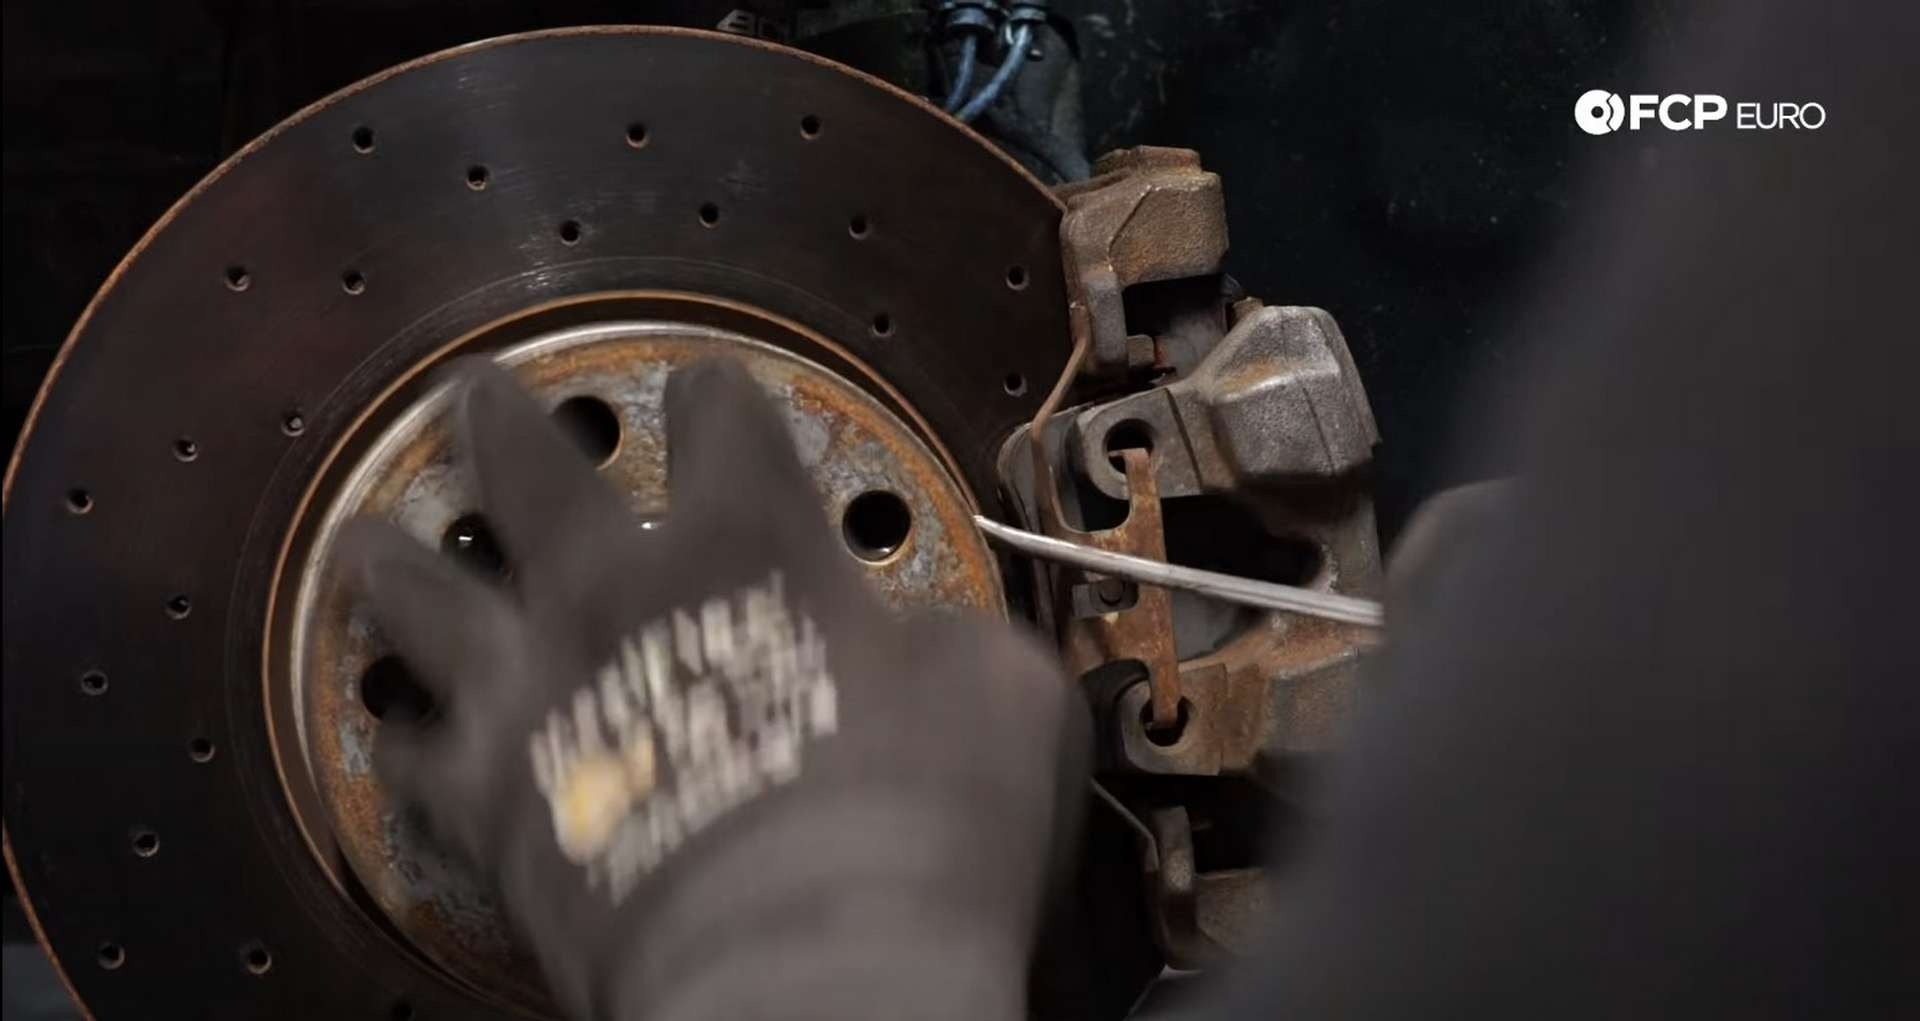 02-DIY-BMW-F30-Front-Brake-Service_Removing-The-Caliper